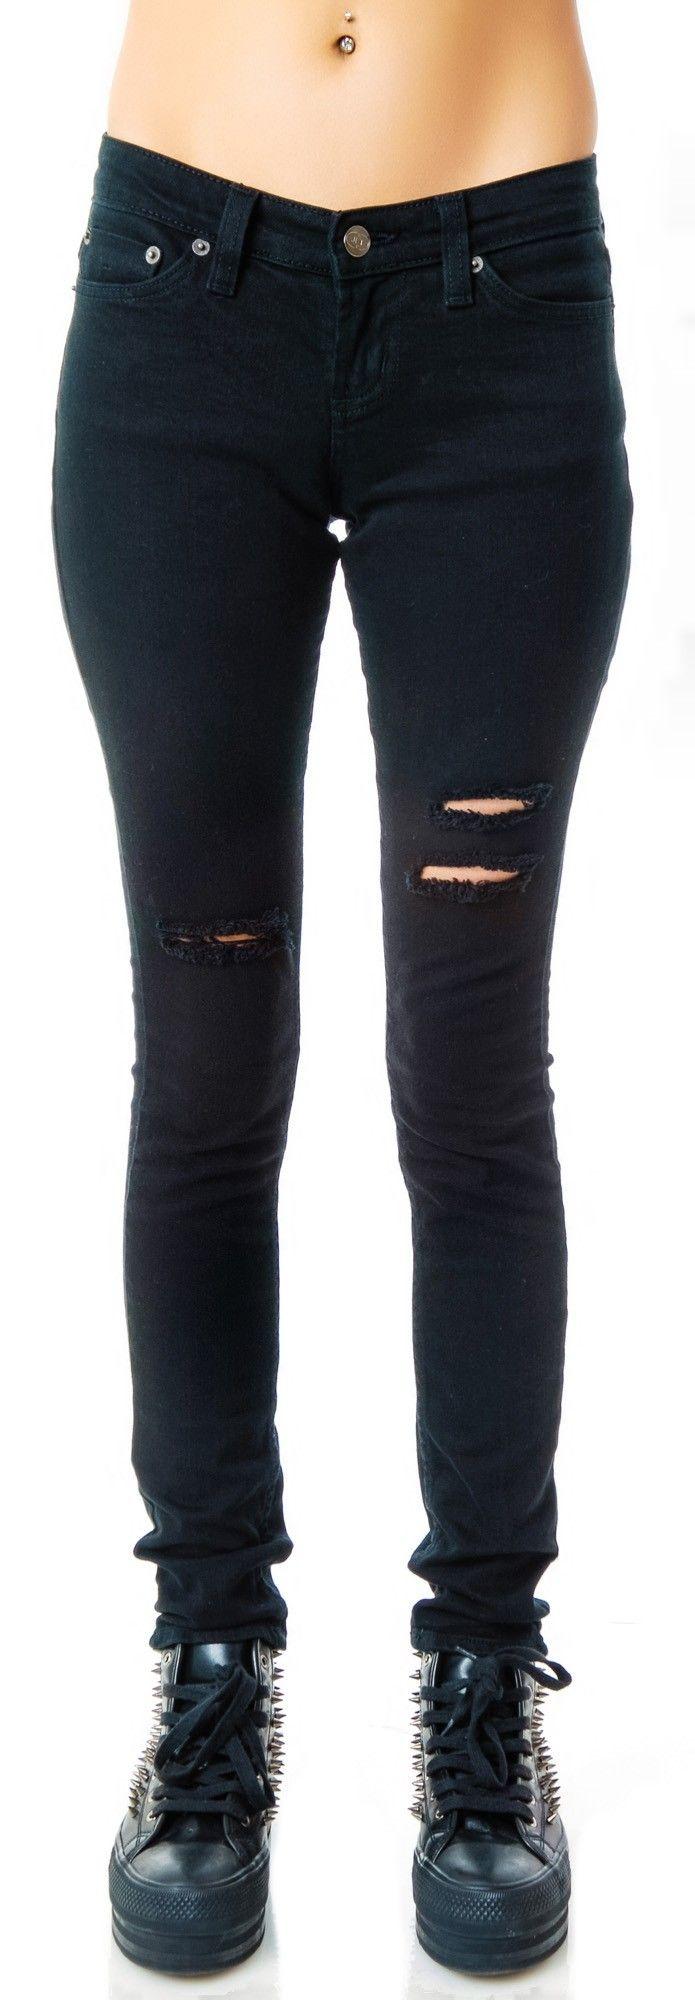 Pants Black Ripped Skinny Jeans